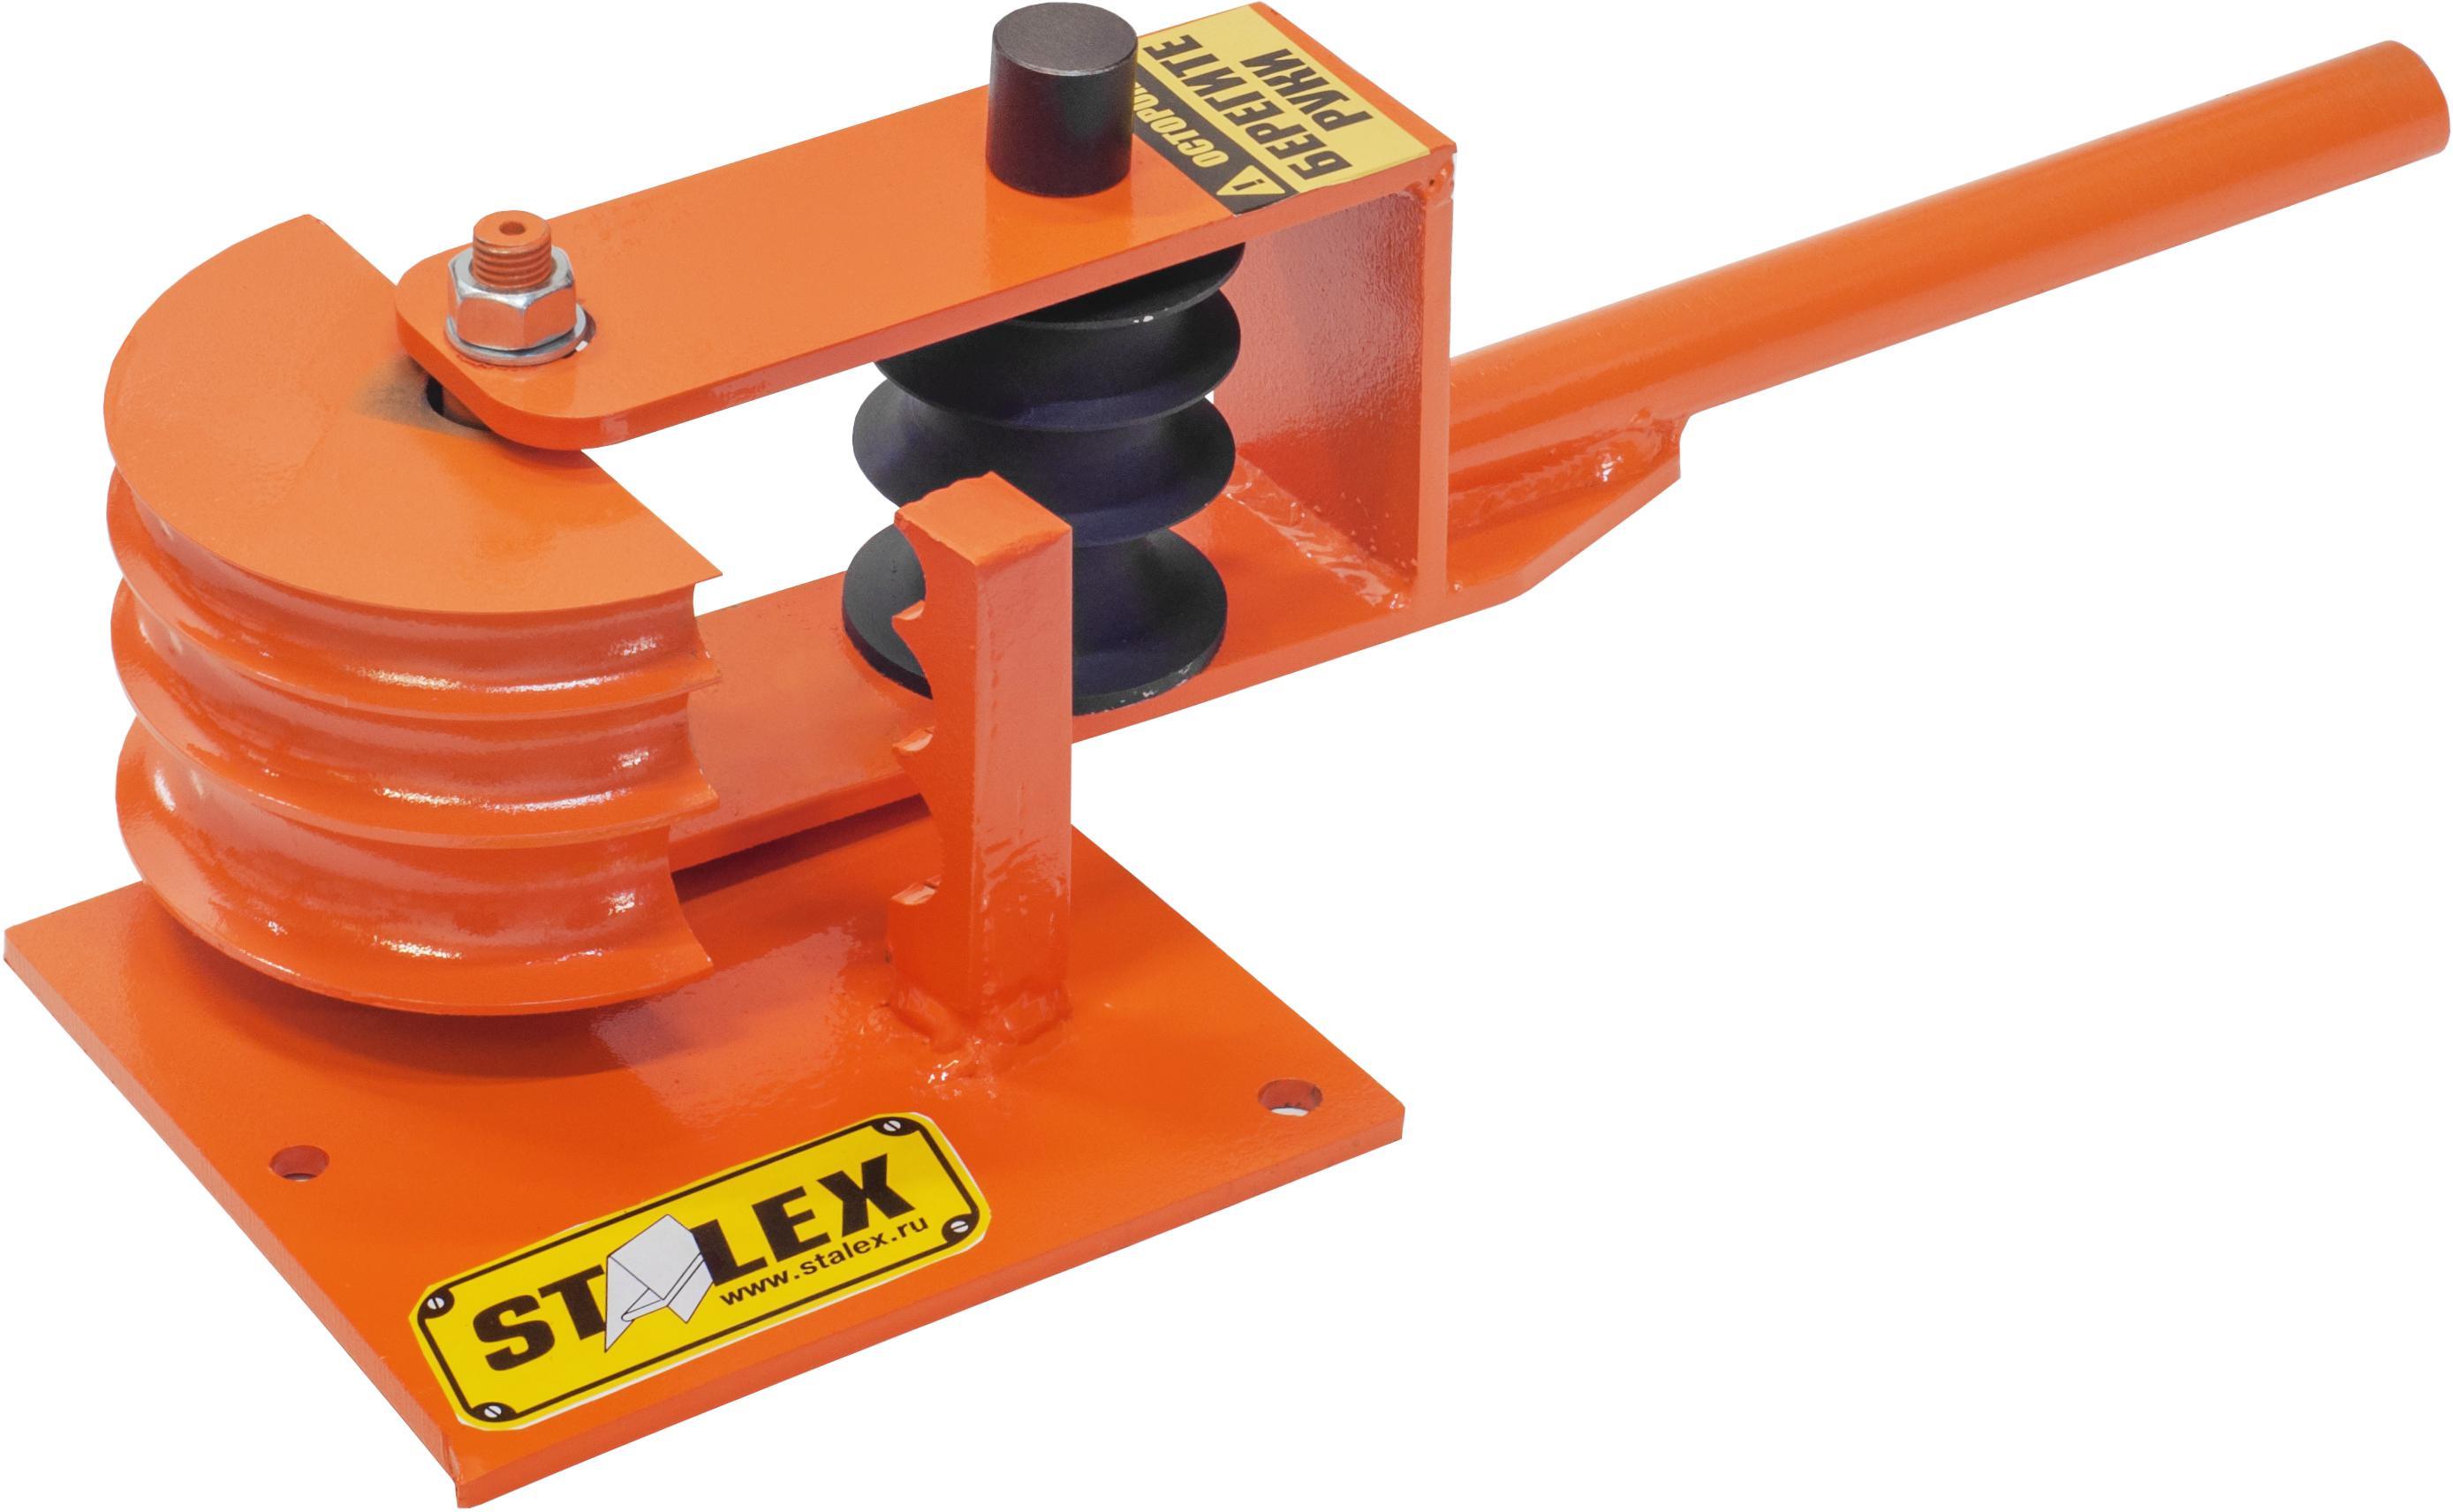 Трубогиб Stalex Tr-10